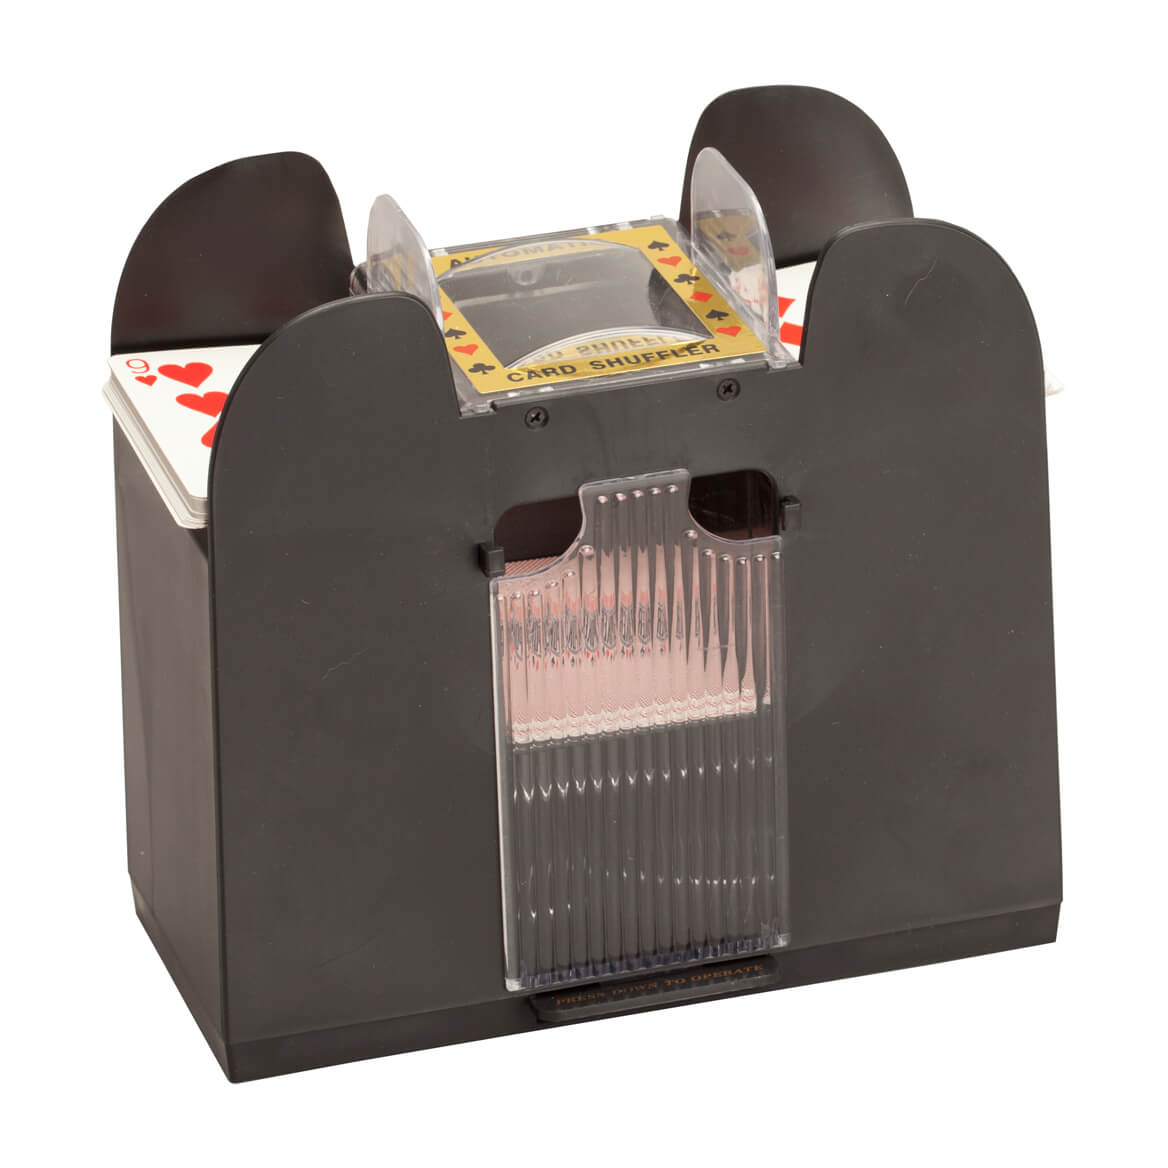 6 deck card shuffler machine